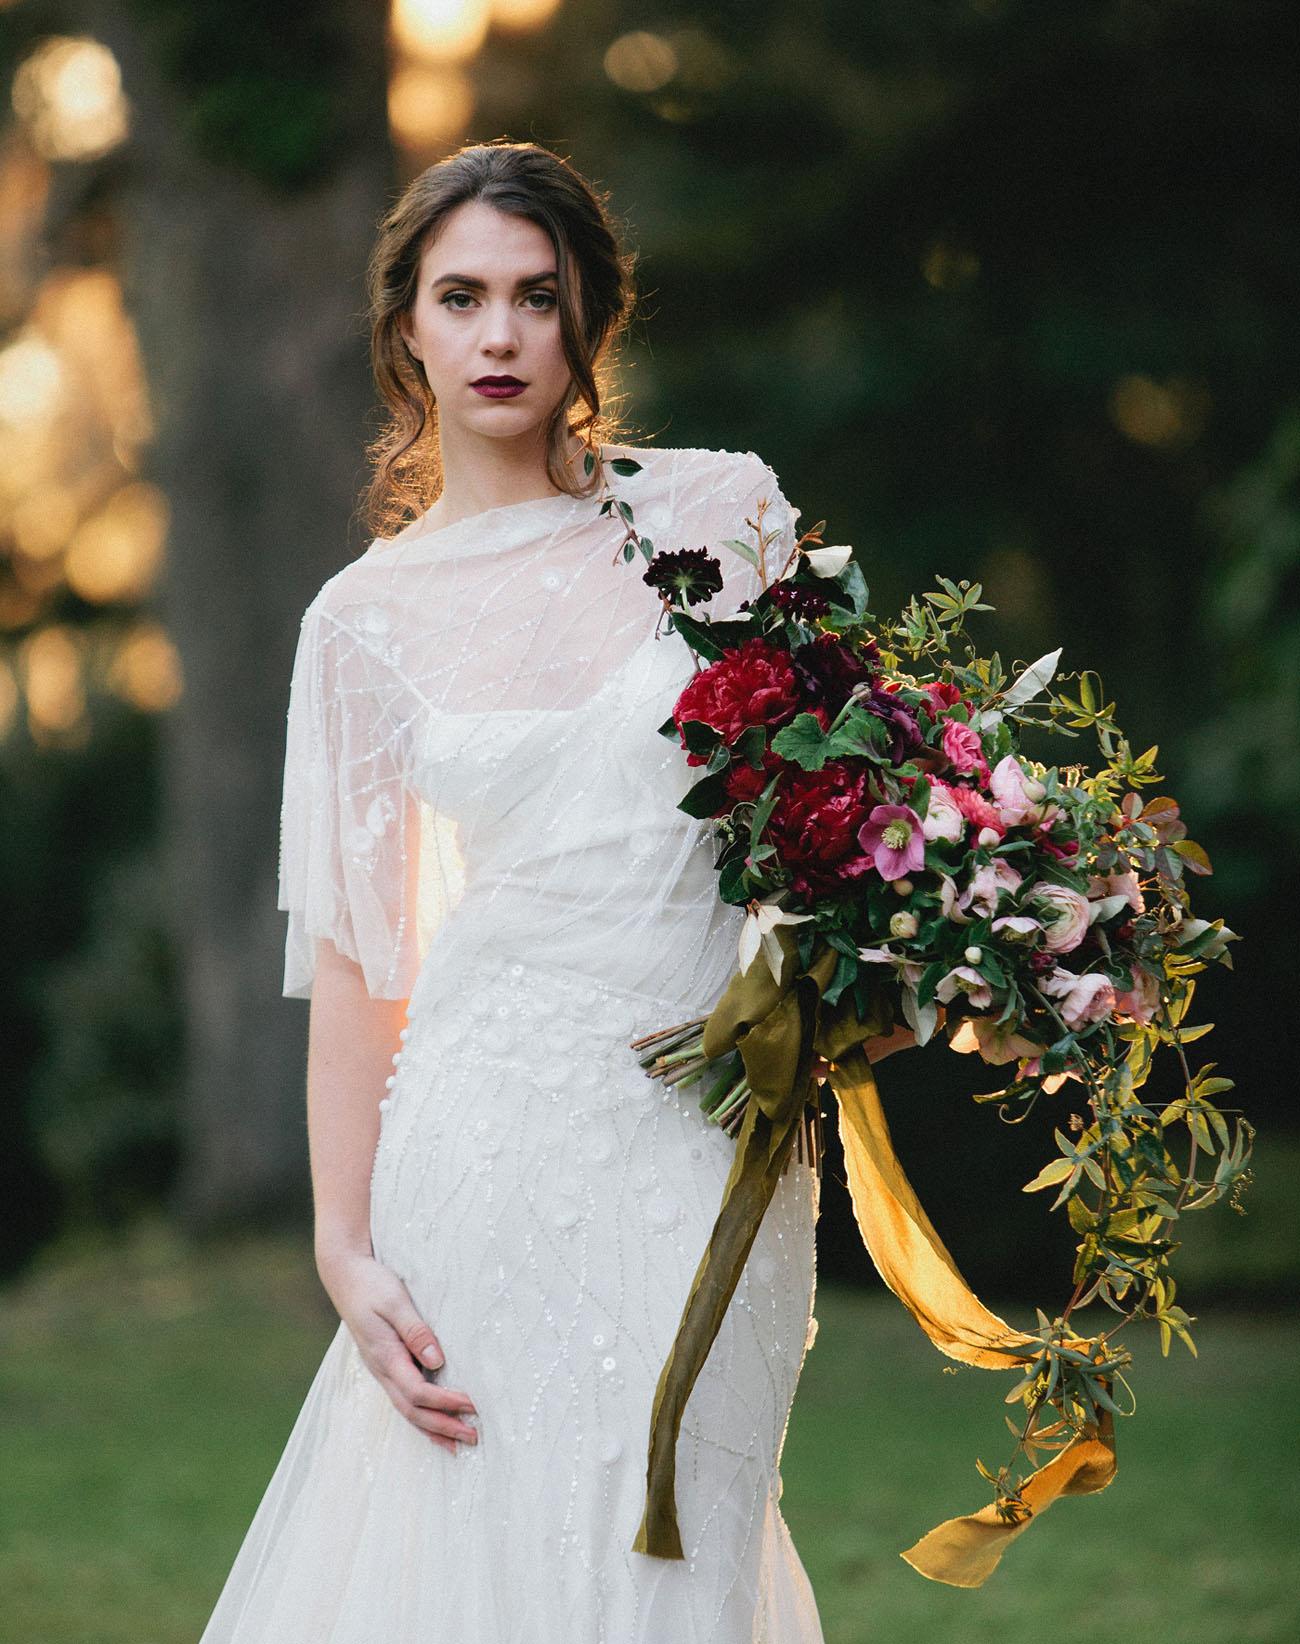 Romeo & Juliet-Inspired Valentine\'s Day Ideas - Green Wedding Shoes